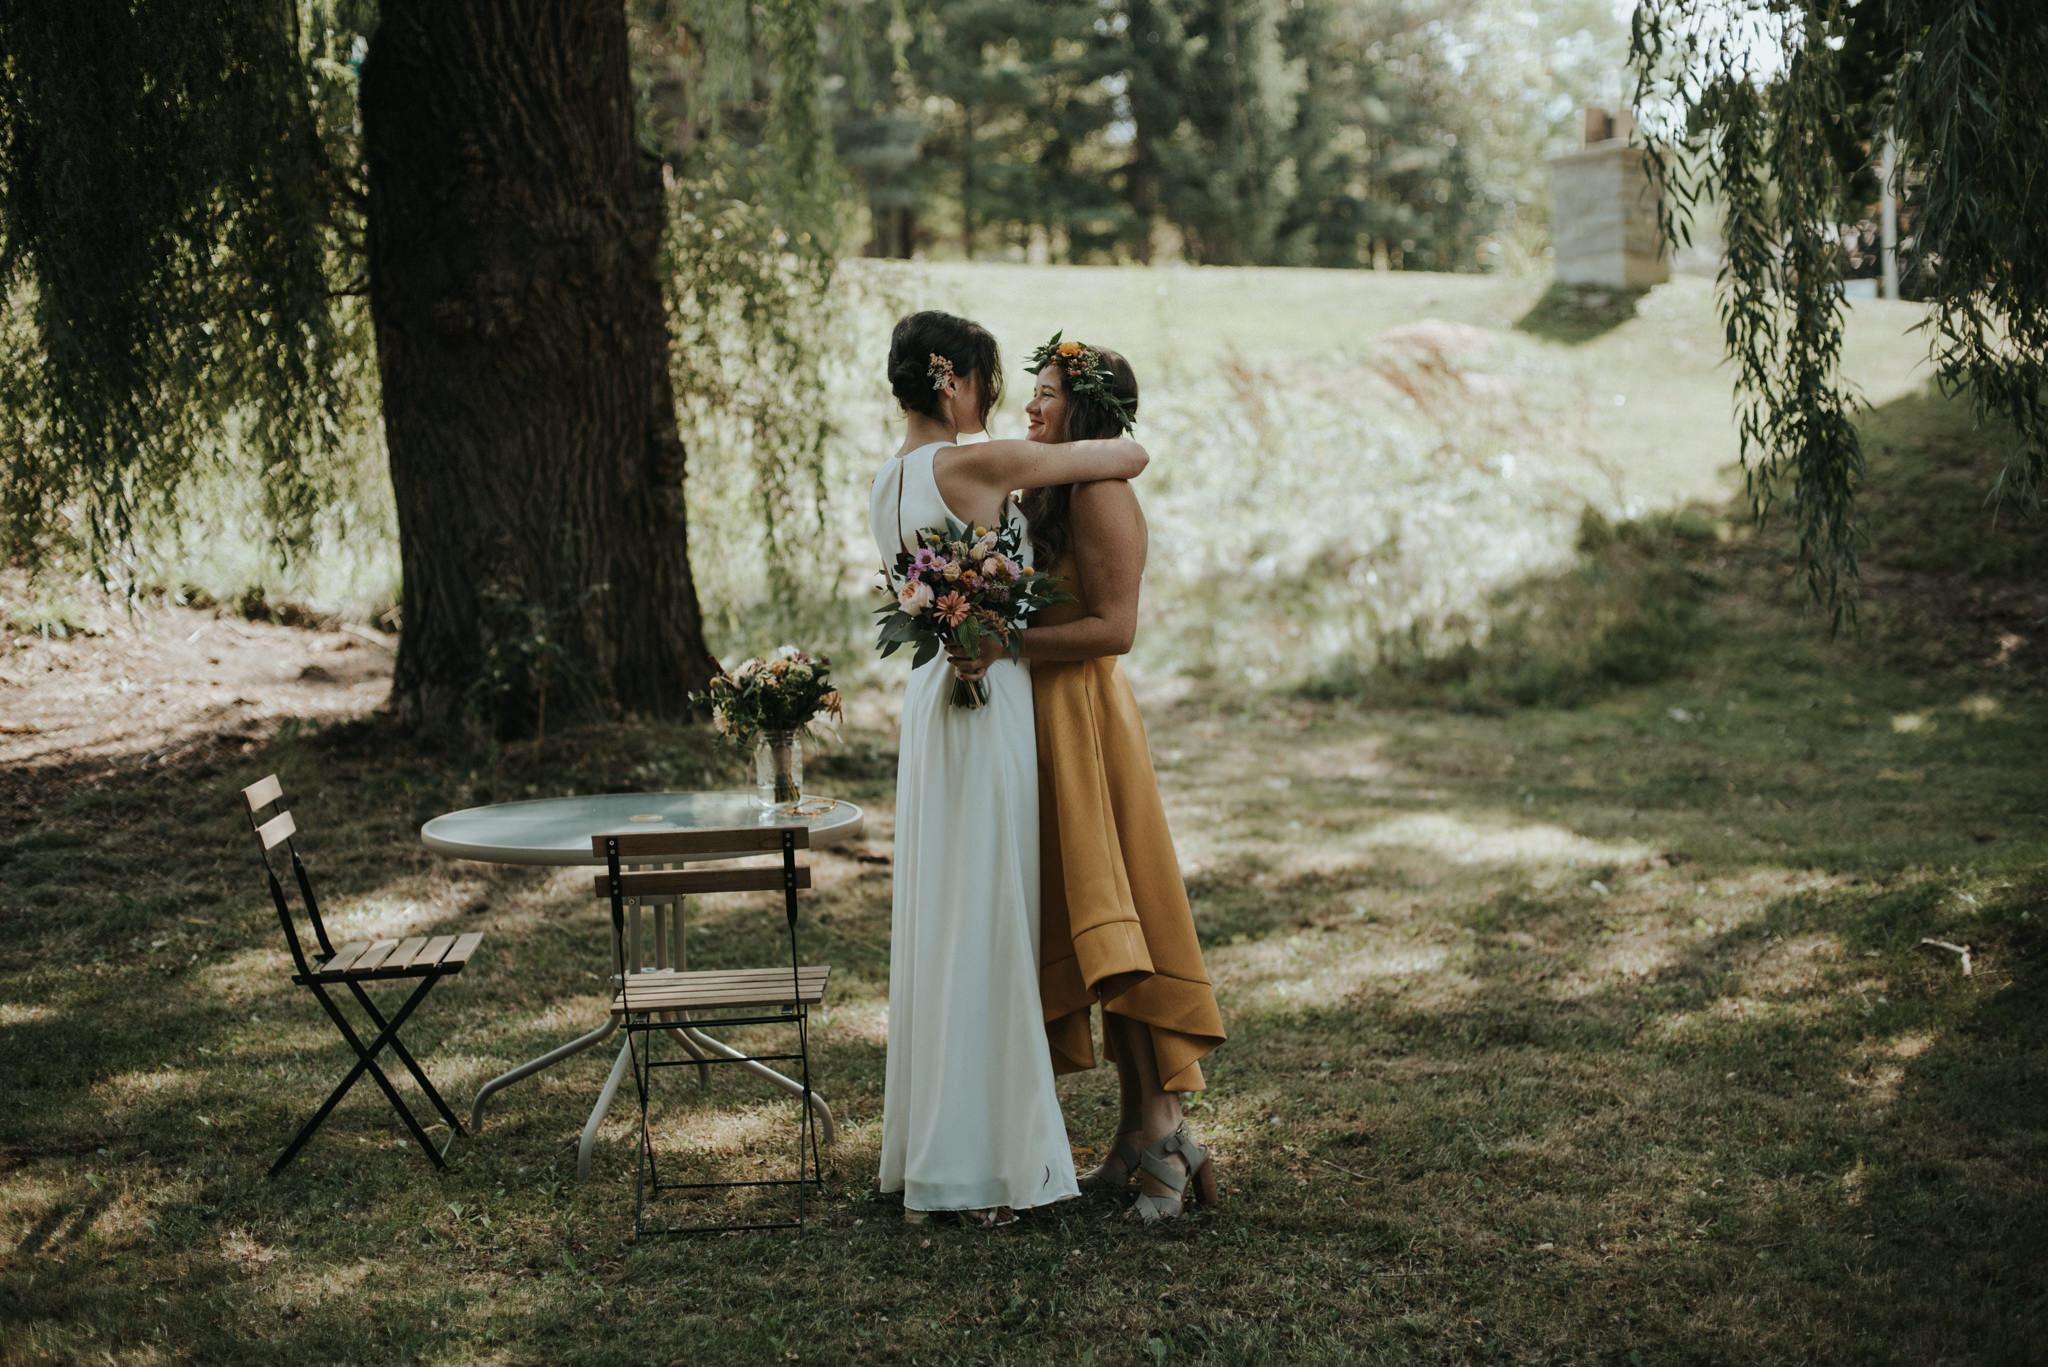 An Intimate Prince Edward County Wedding // Daring Wanderer: www.daringwanderer.com